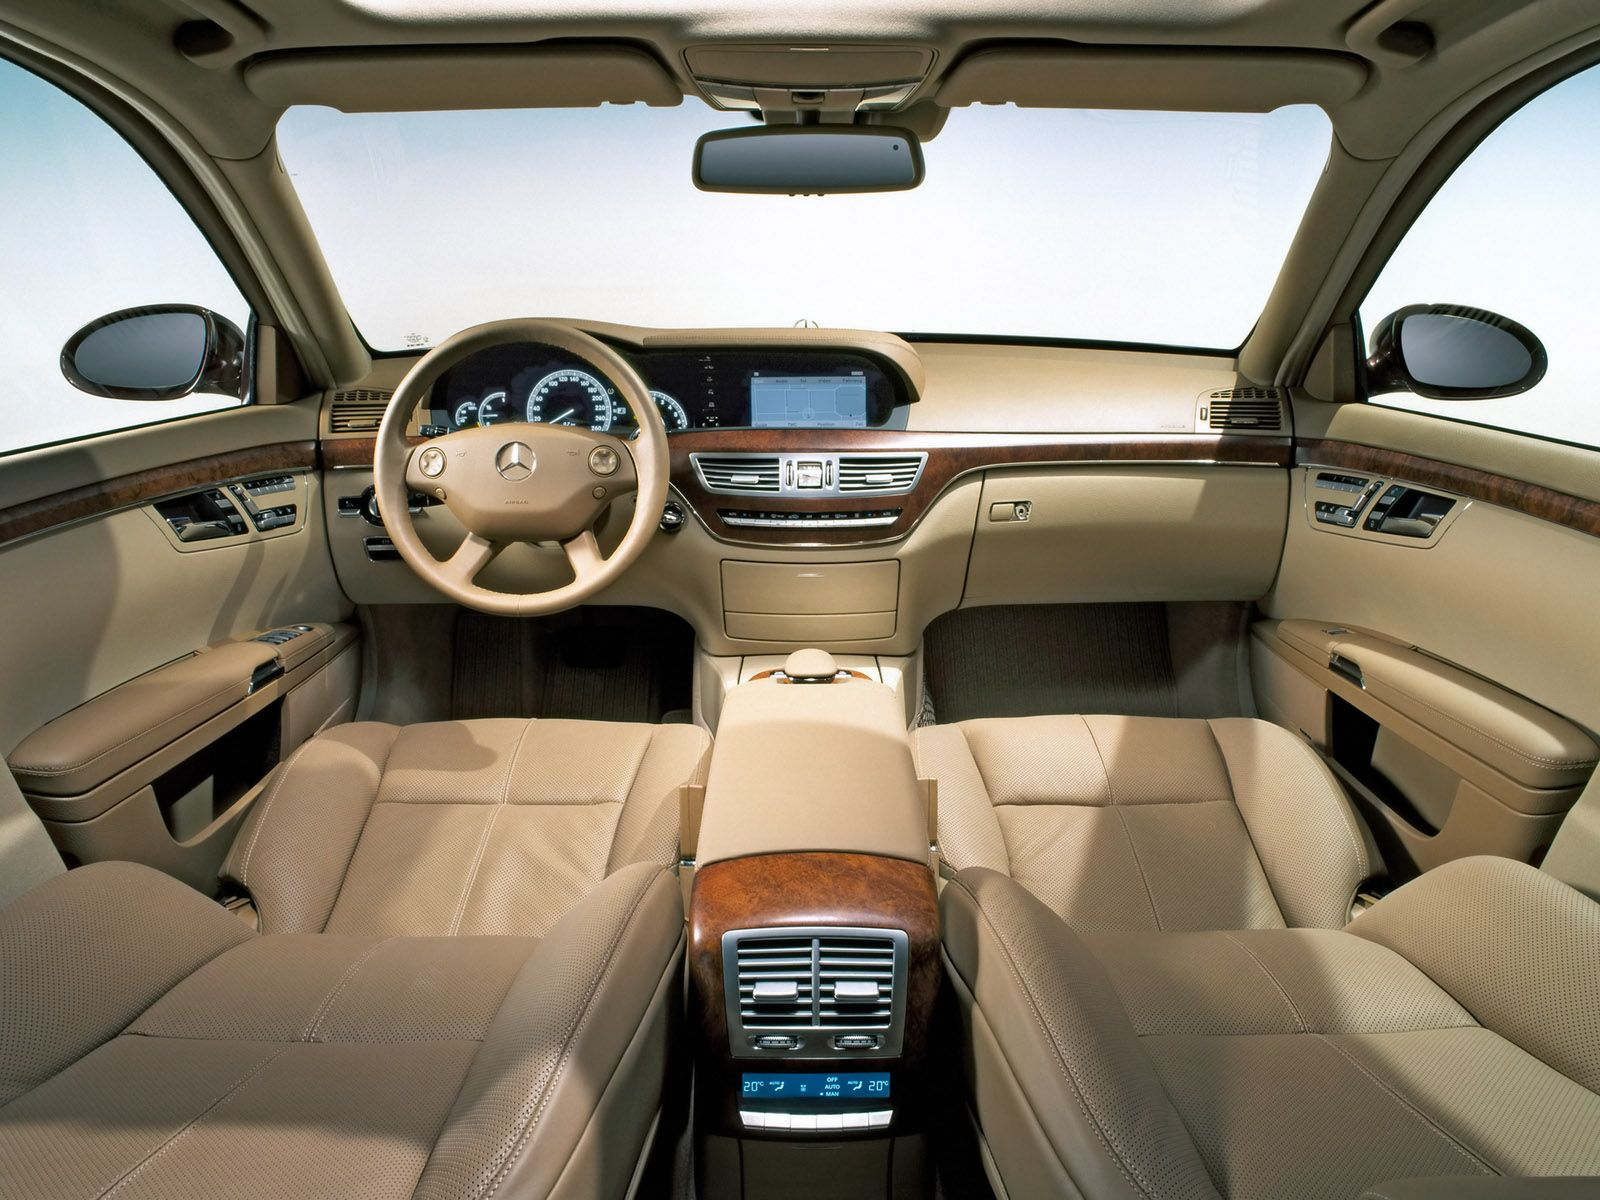 2012 mercedes s class interior